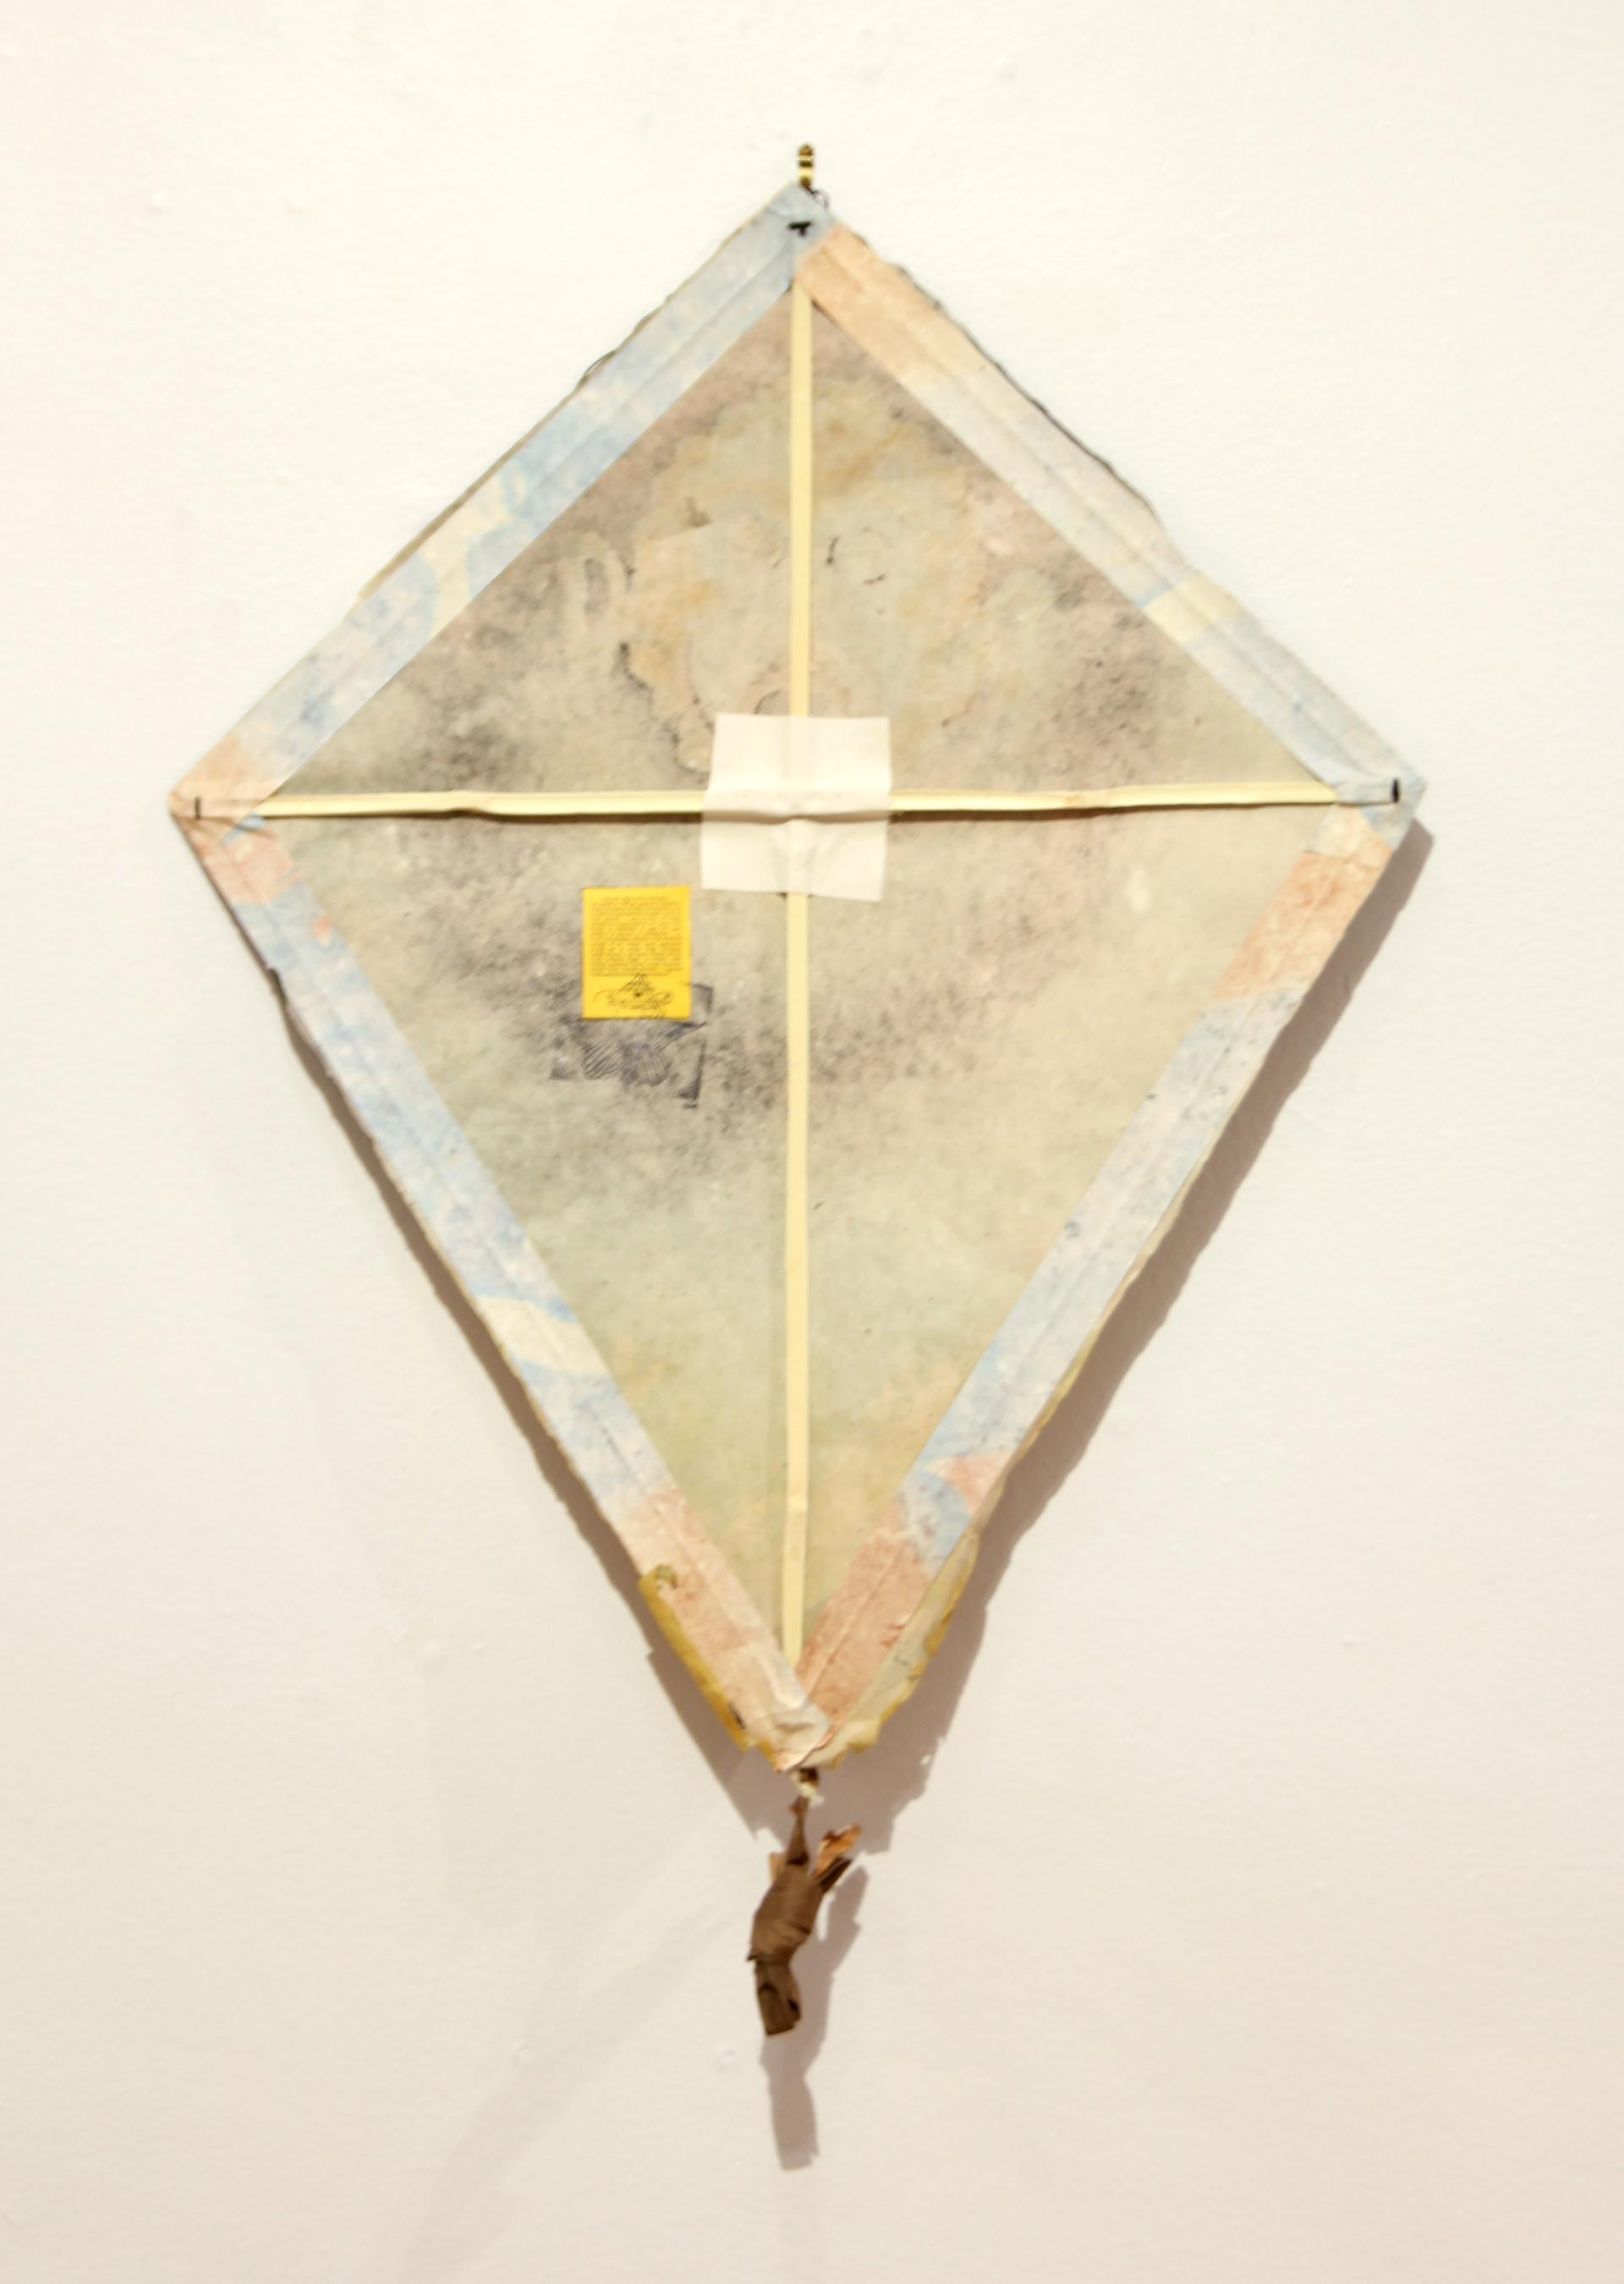 Mono Kite by Francisco Toledo (1940 - 2019)